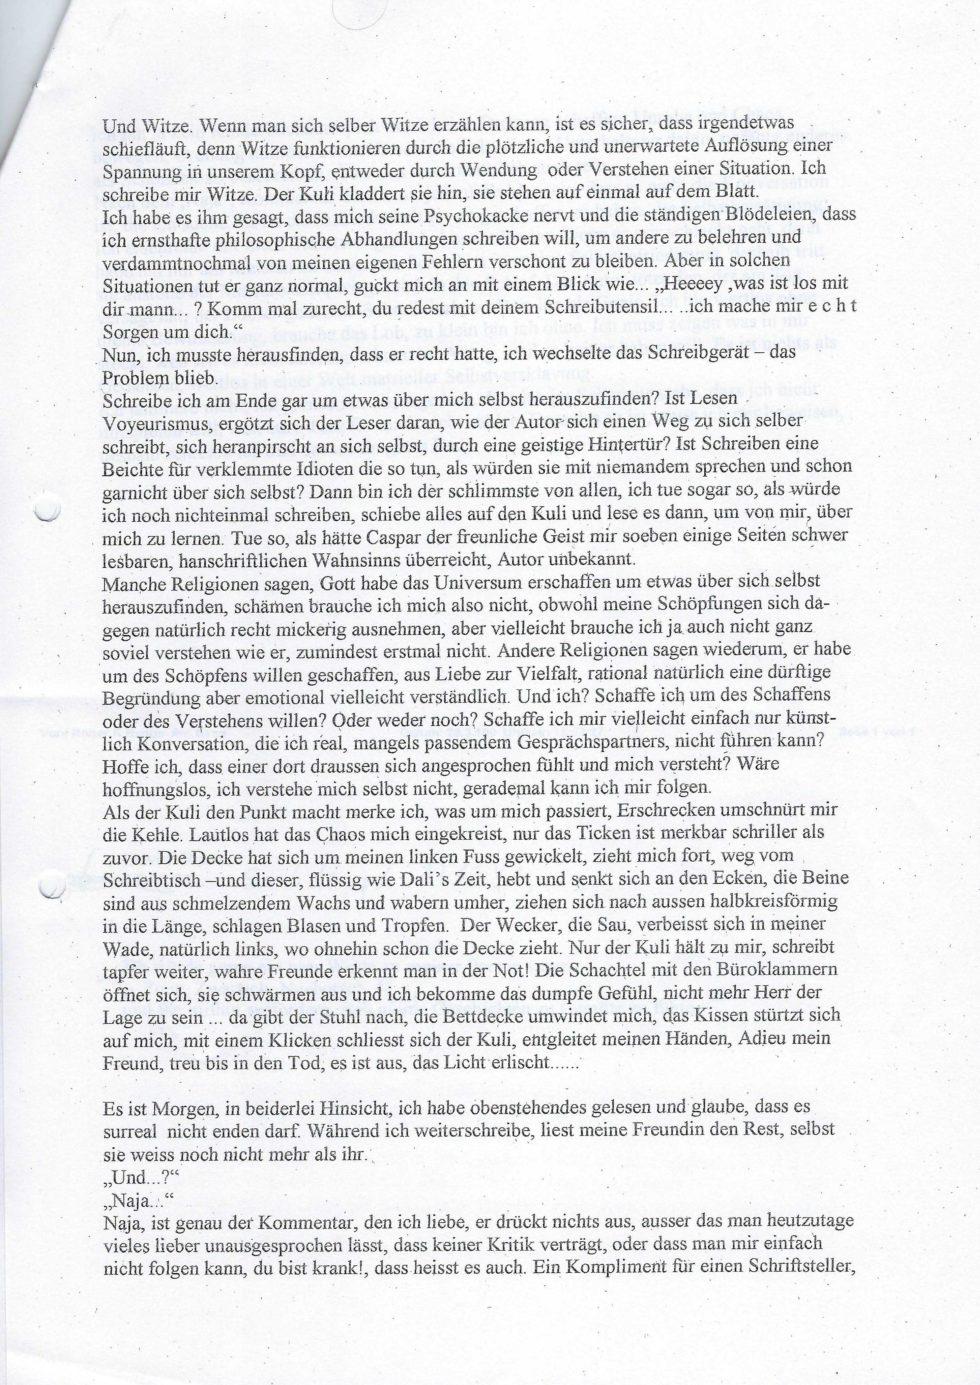 Säulen_Texte_Seite_09